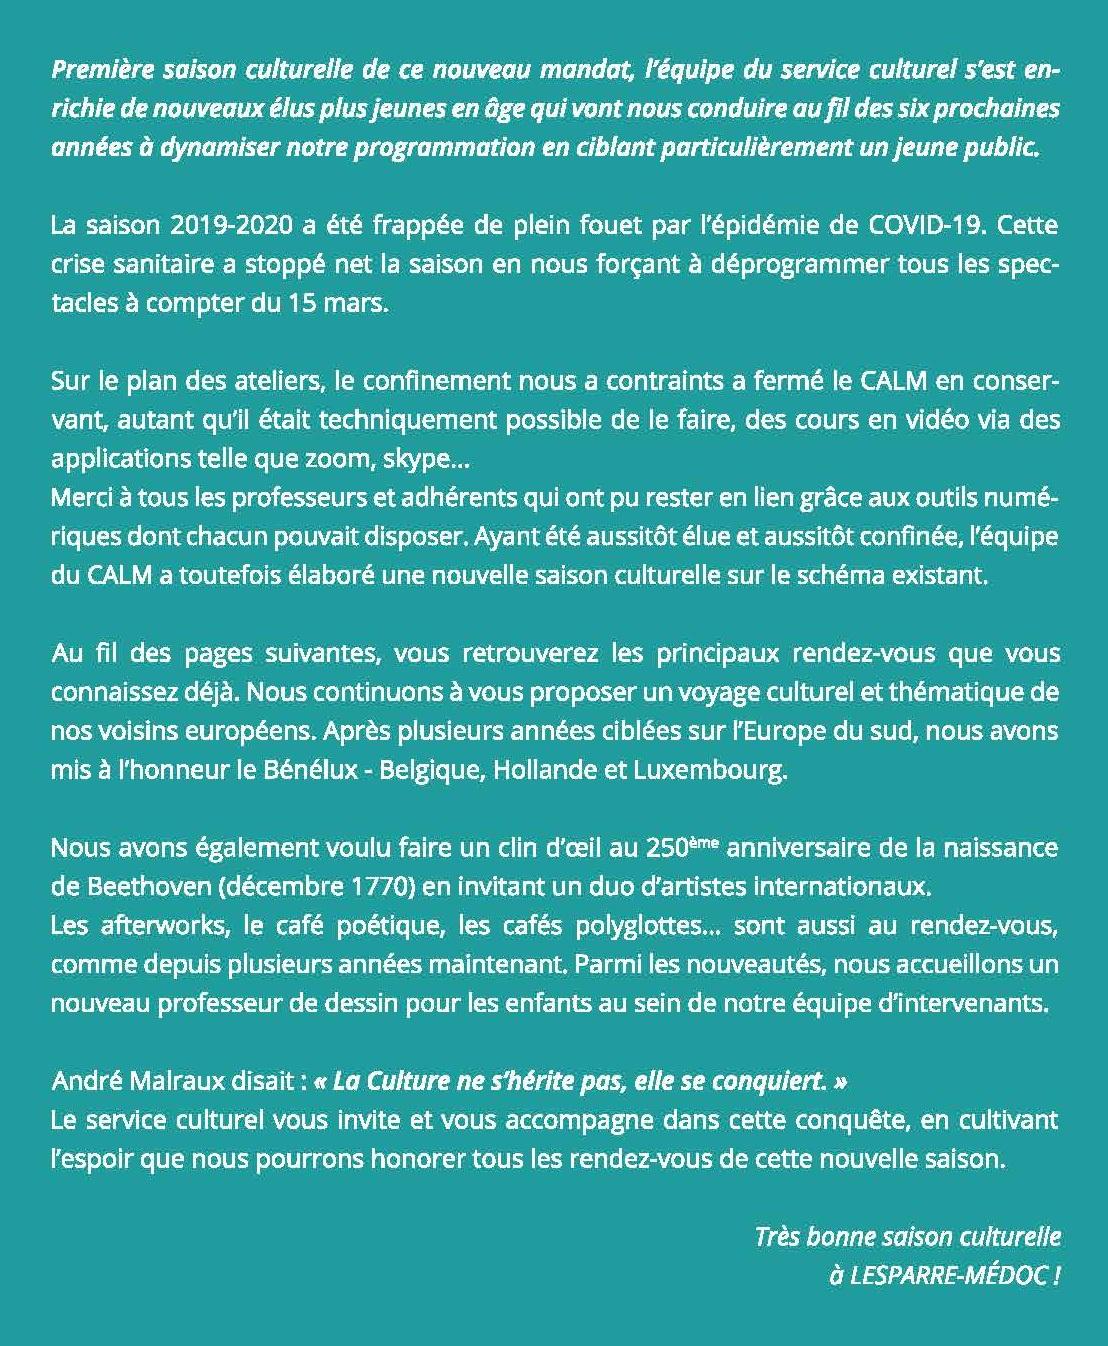 Edito Saison culturelle 2020-2021